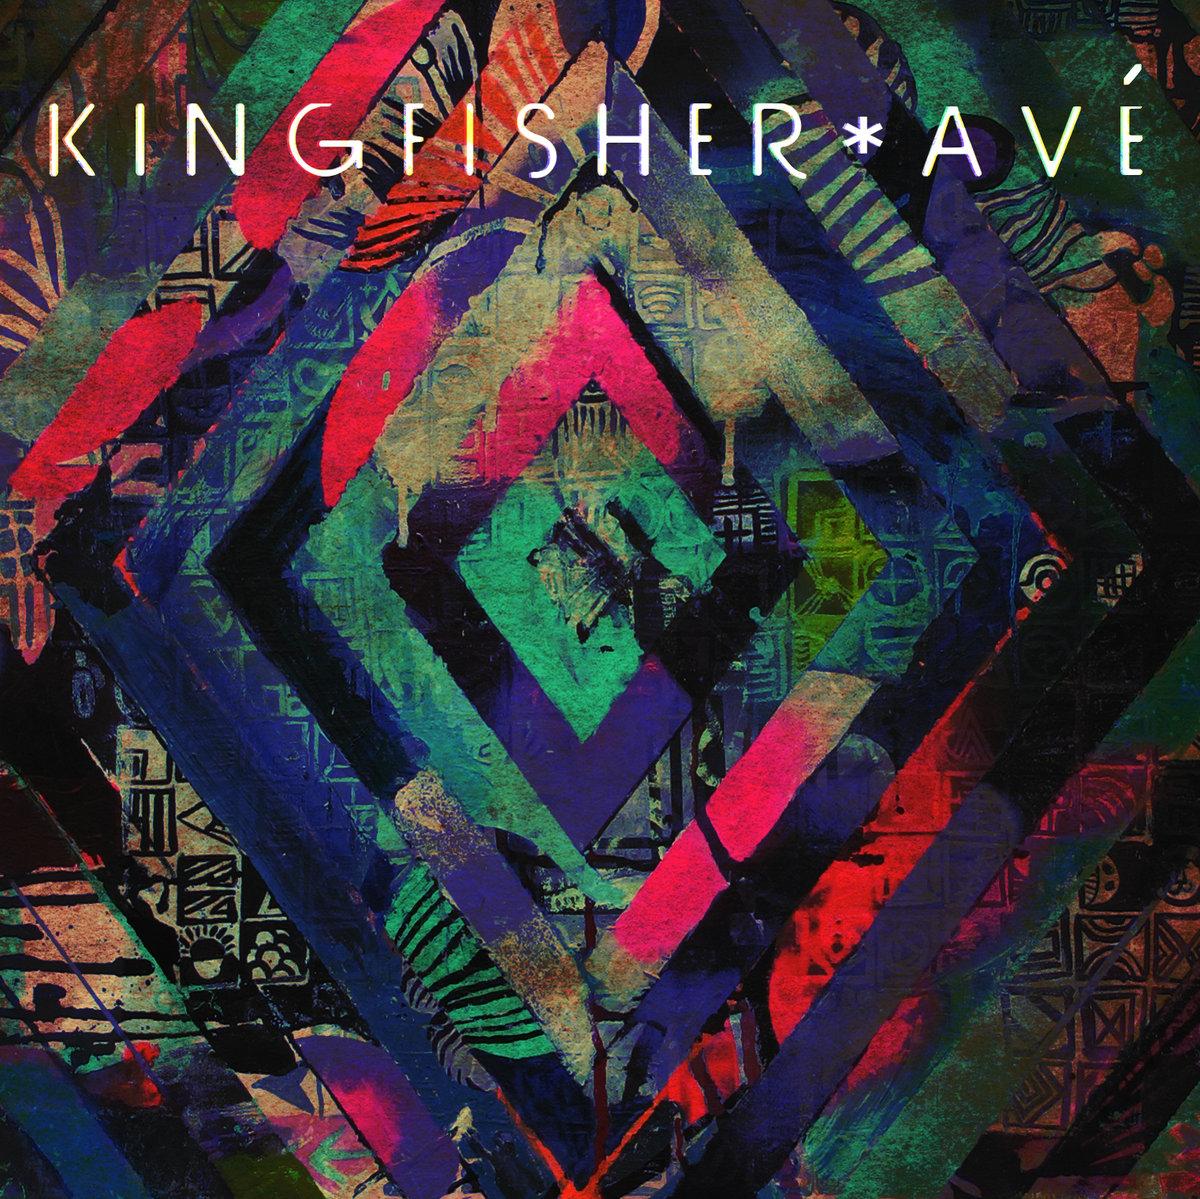 Kingfisher - Avé